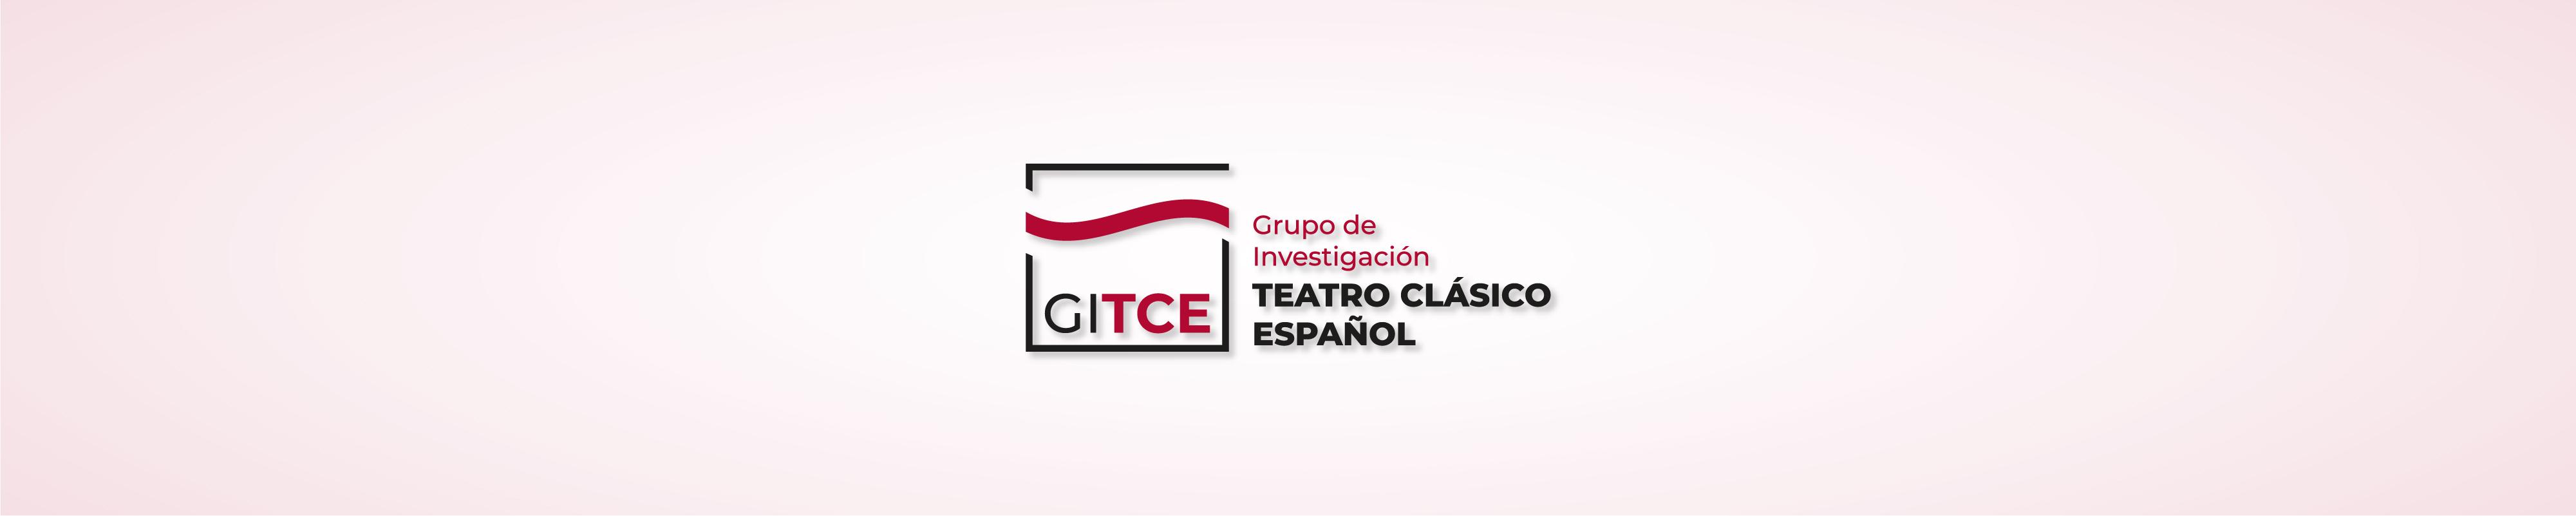 Logotipo Grupo de Investigación de Teatro Clásico Español